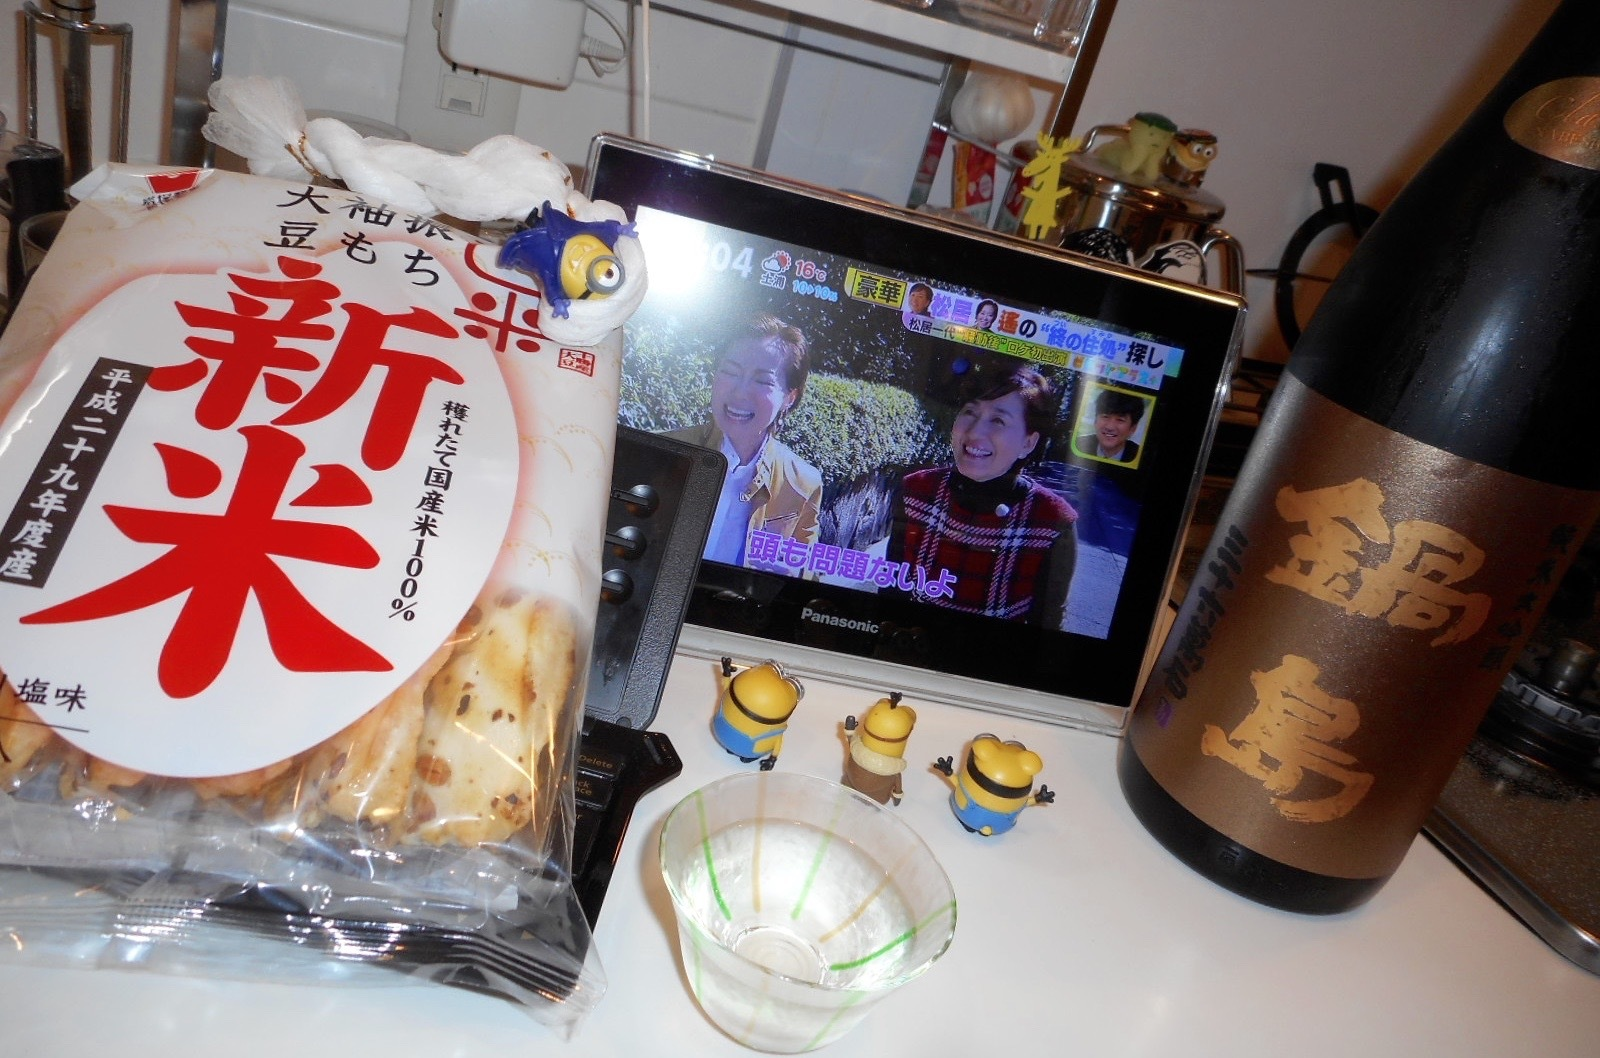 nabeshima_jundai_yoshikawa28by15.jpg